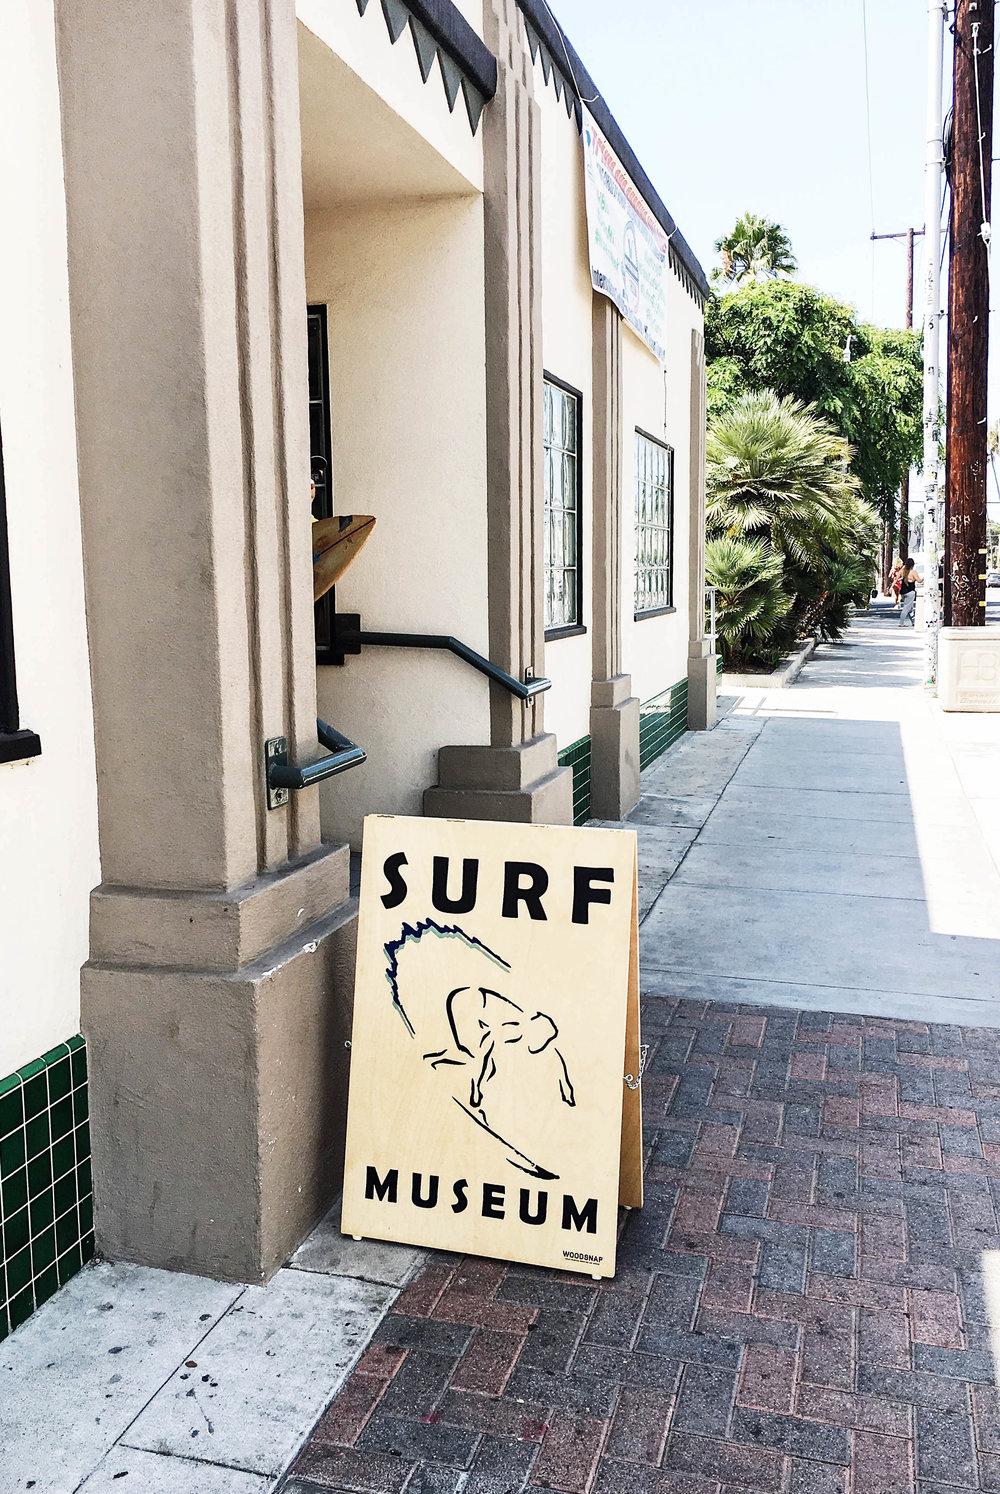 huntington beach surf museum - taylorkristiina.com